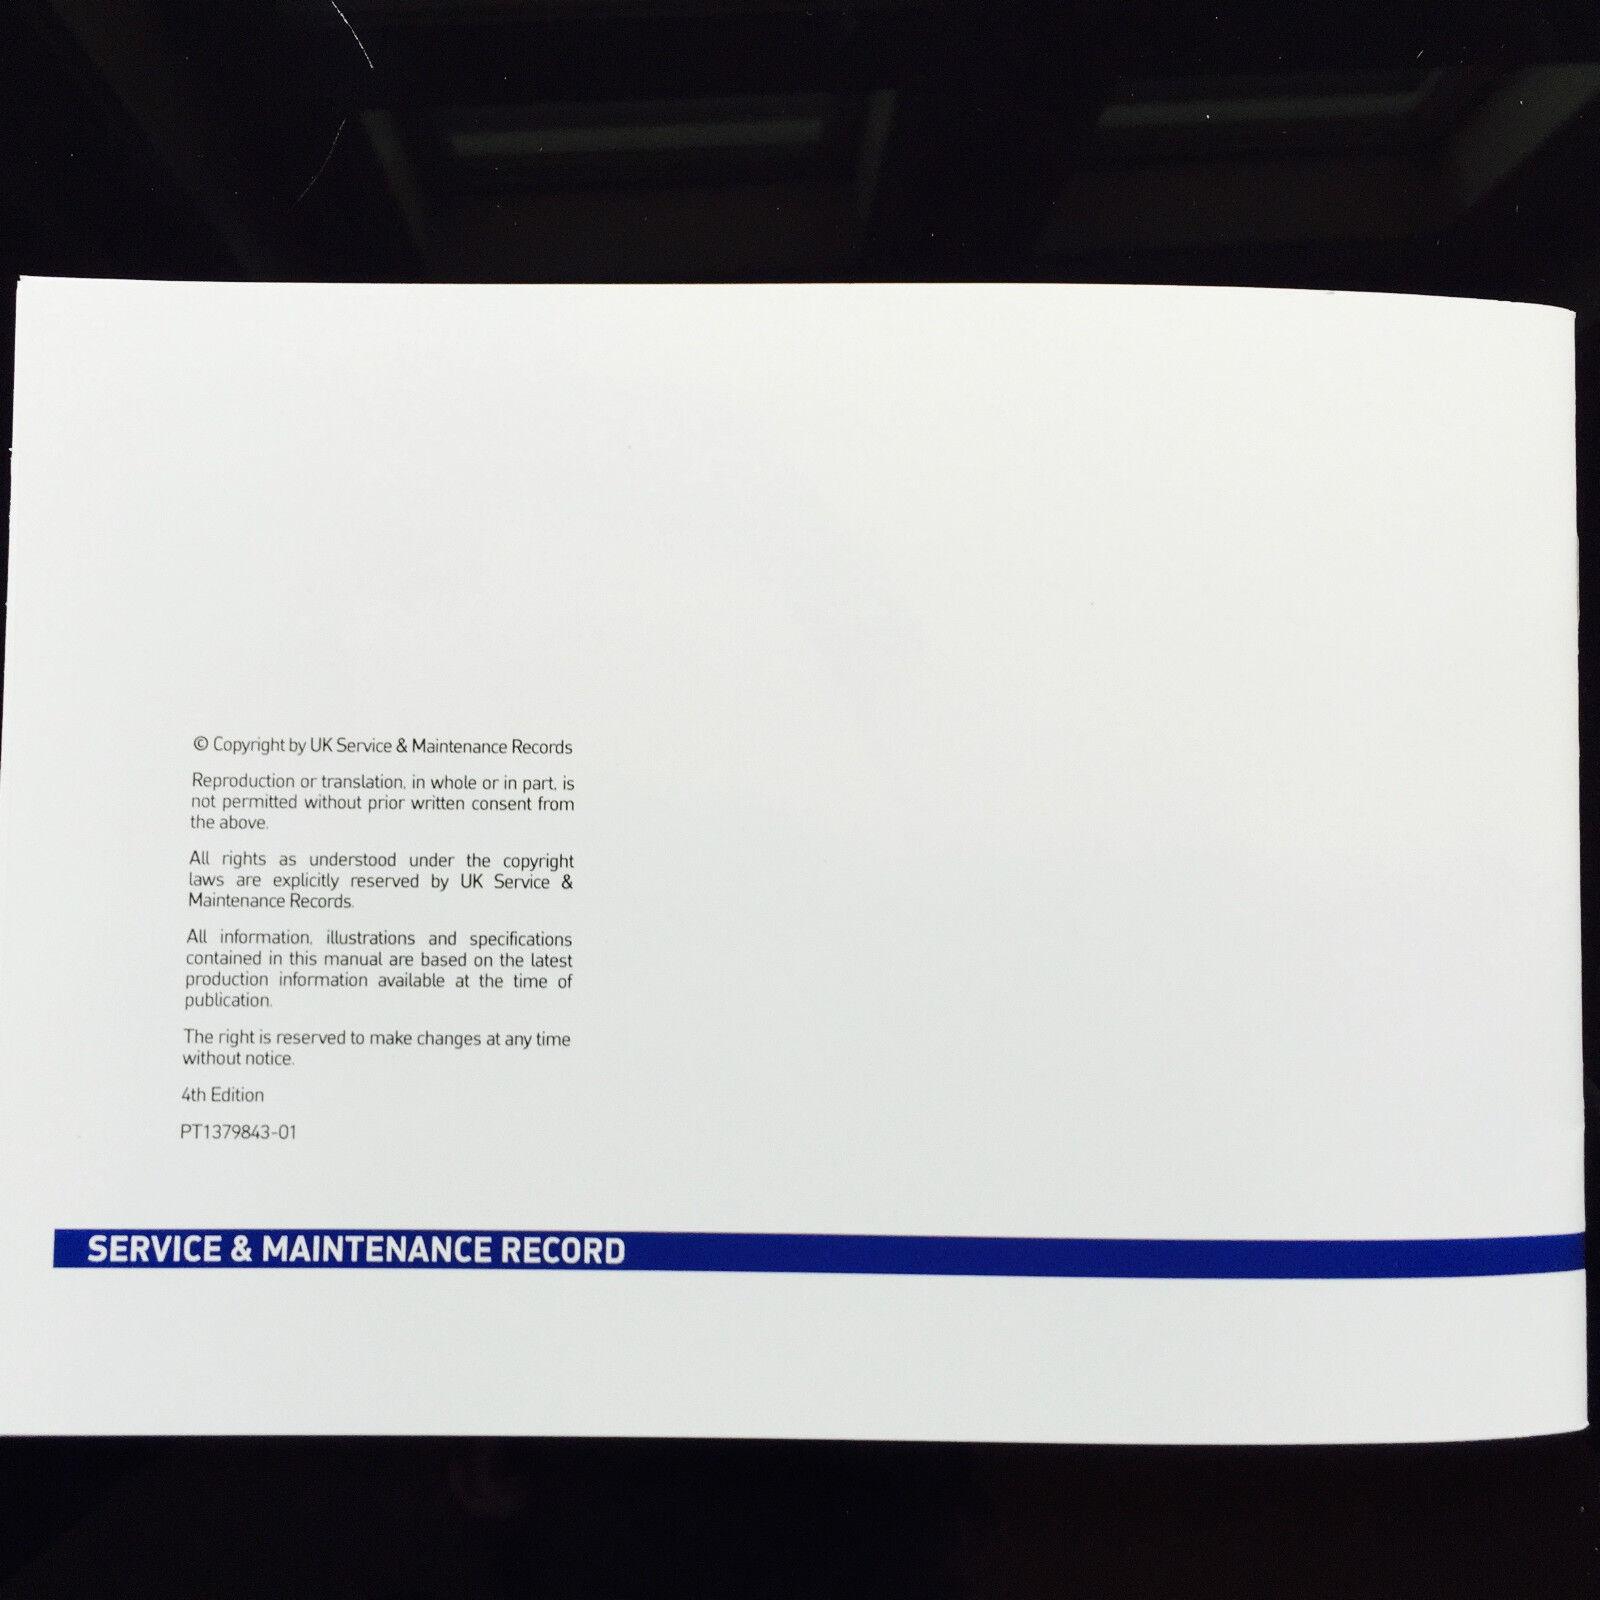 Alfa Romeo Brera Service Book History Maintenance Record New 159 Workshop Manual Download 6 Of See More